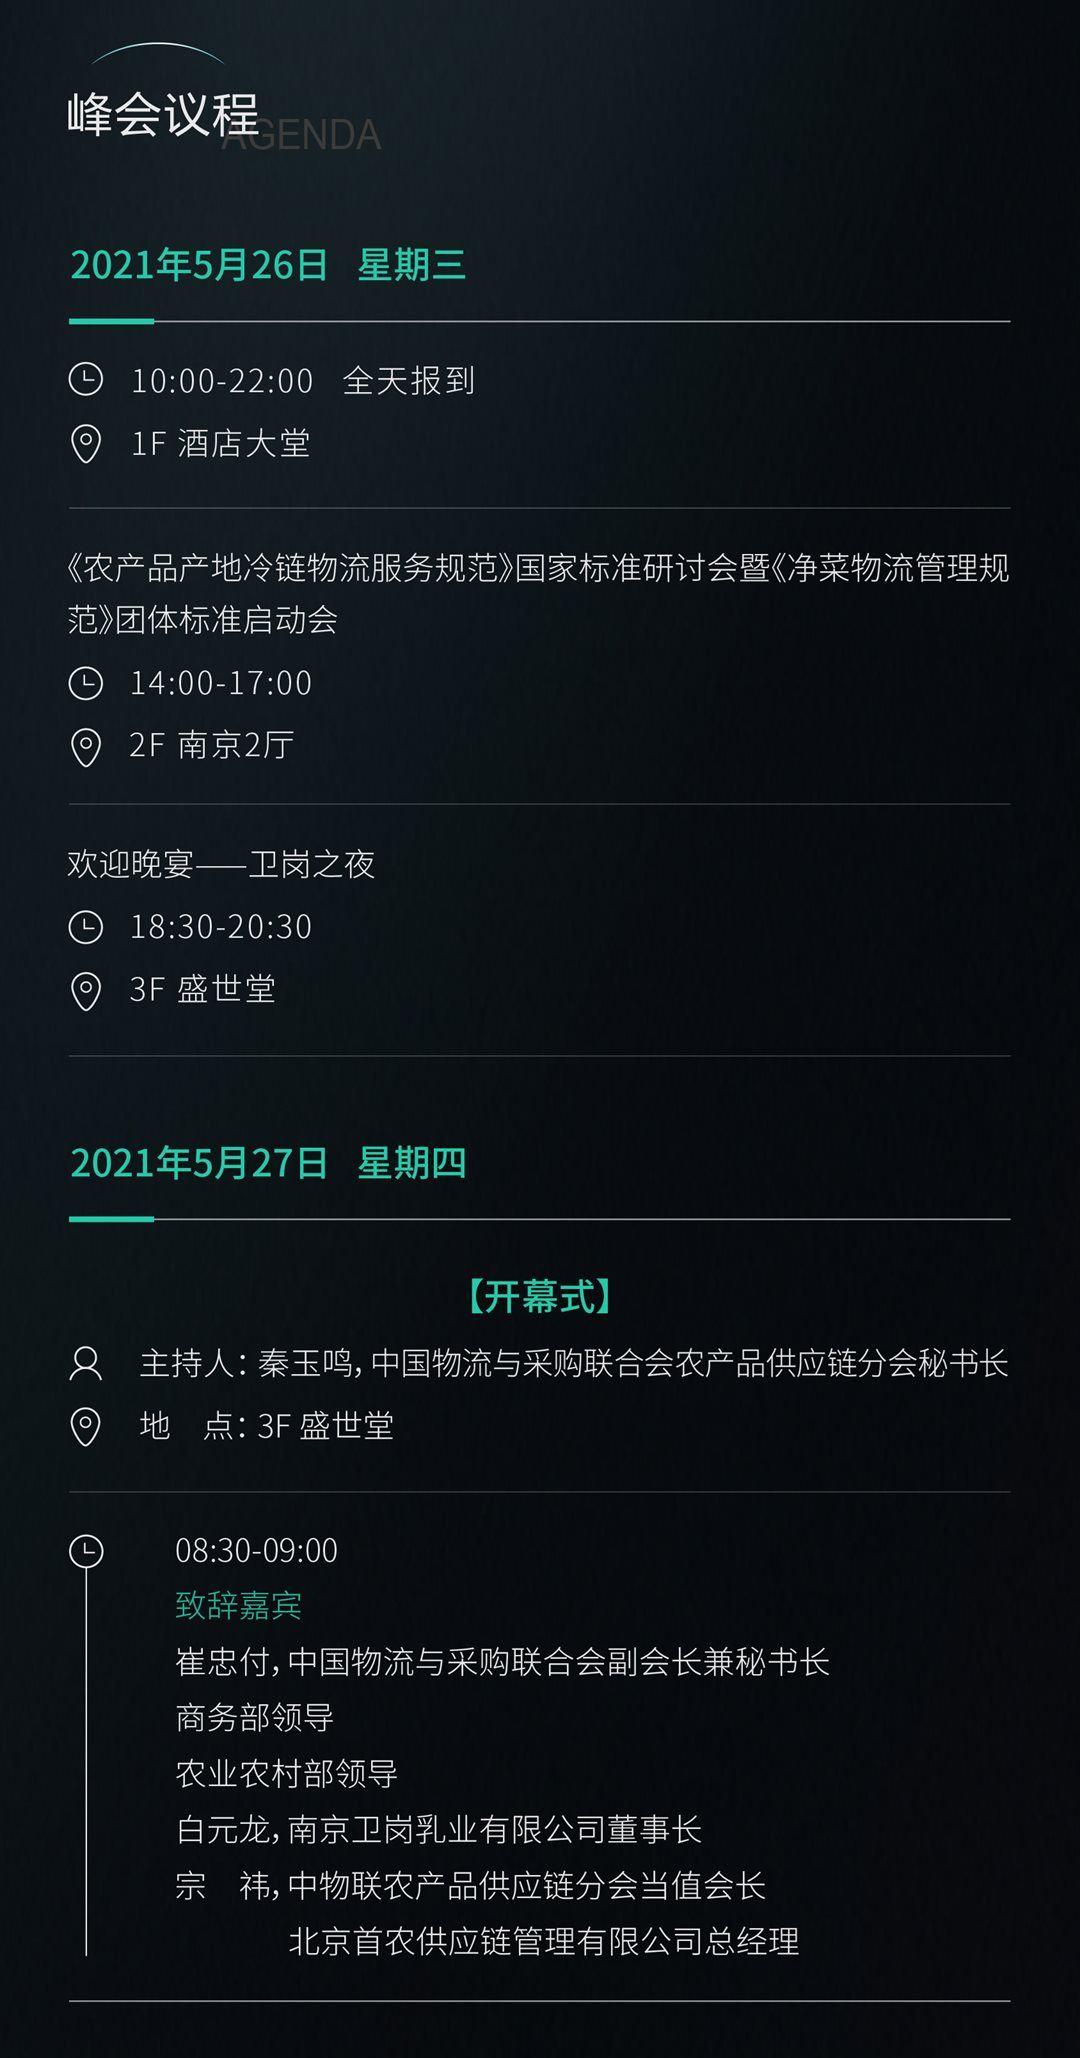 【20210511】议程长图_画板-1_02.png